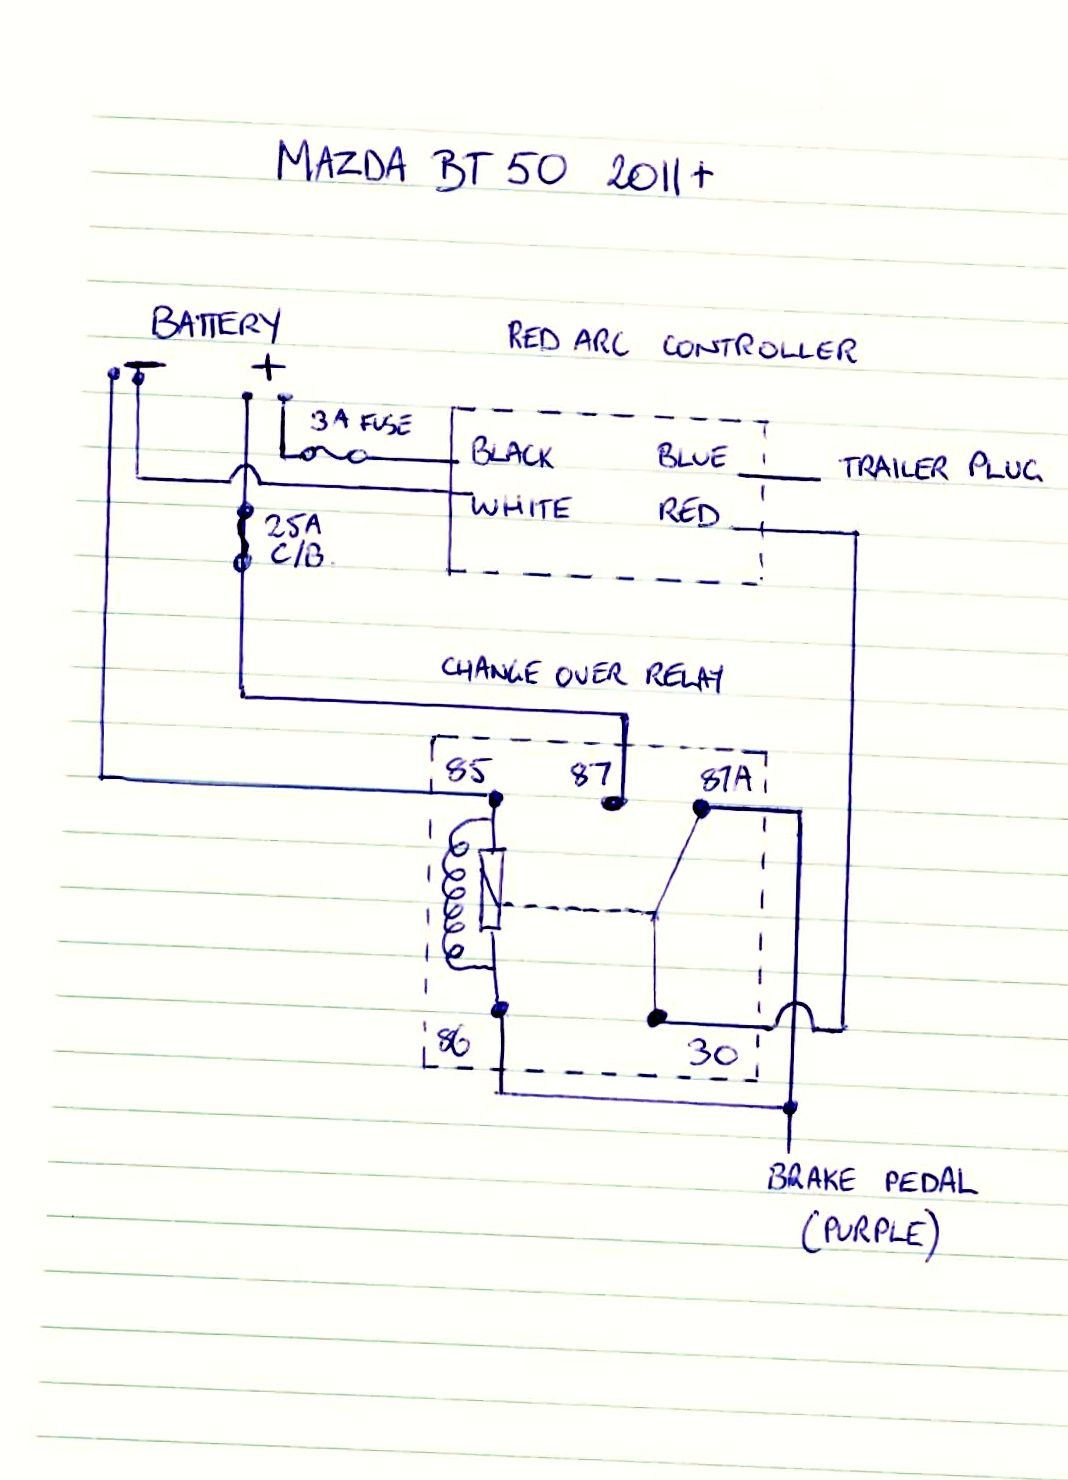 BT 50 Brake Controller Wiring Diagram | Discovery LR5 4x4